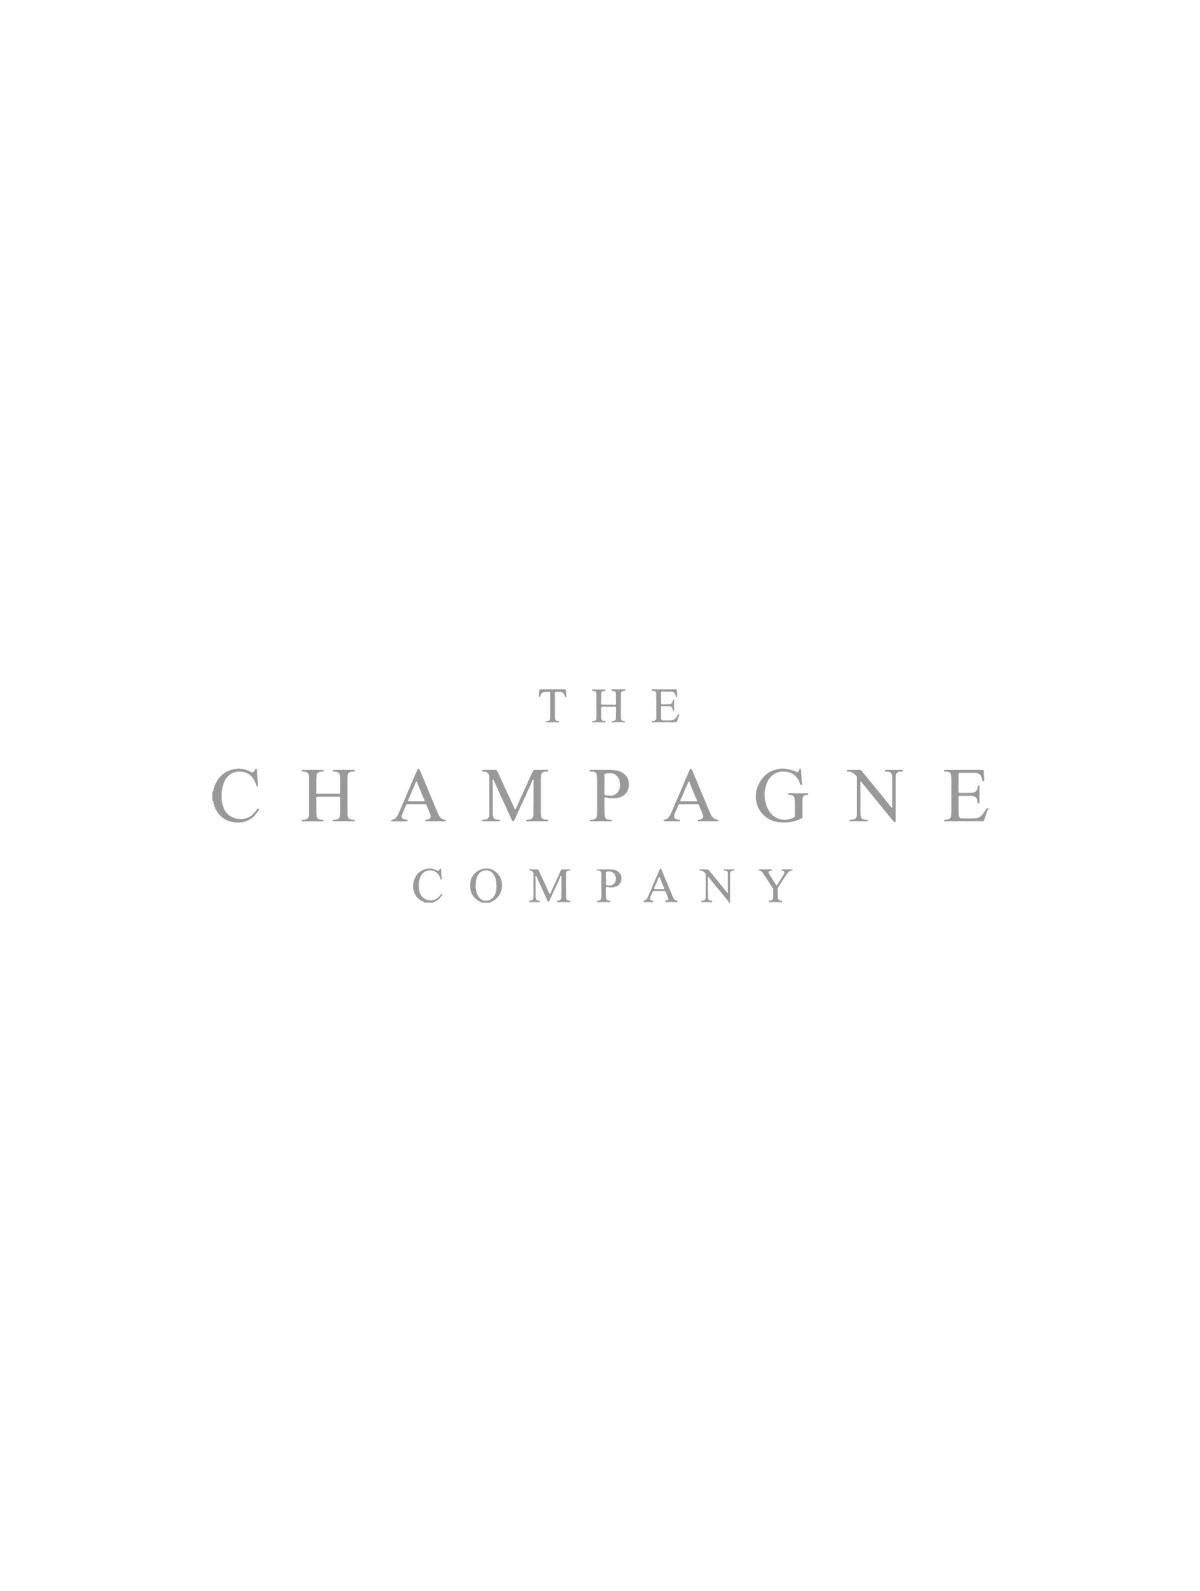 Tapanappa Cabernet Franc Merlot Whalebone Vineyard Red Wine 2010 75cl